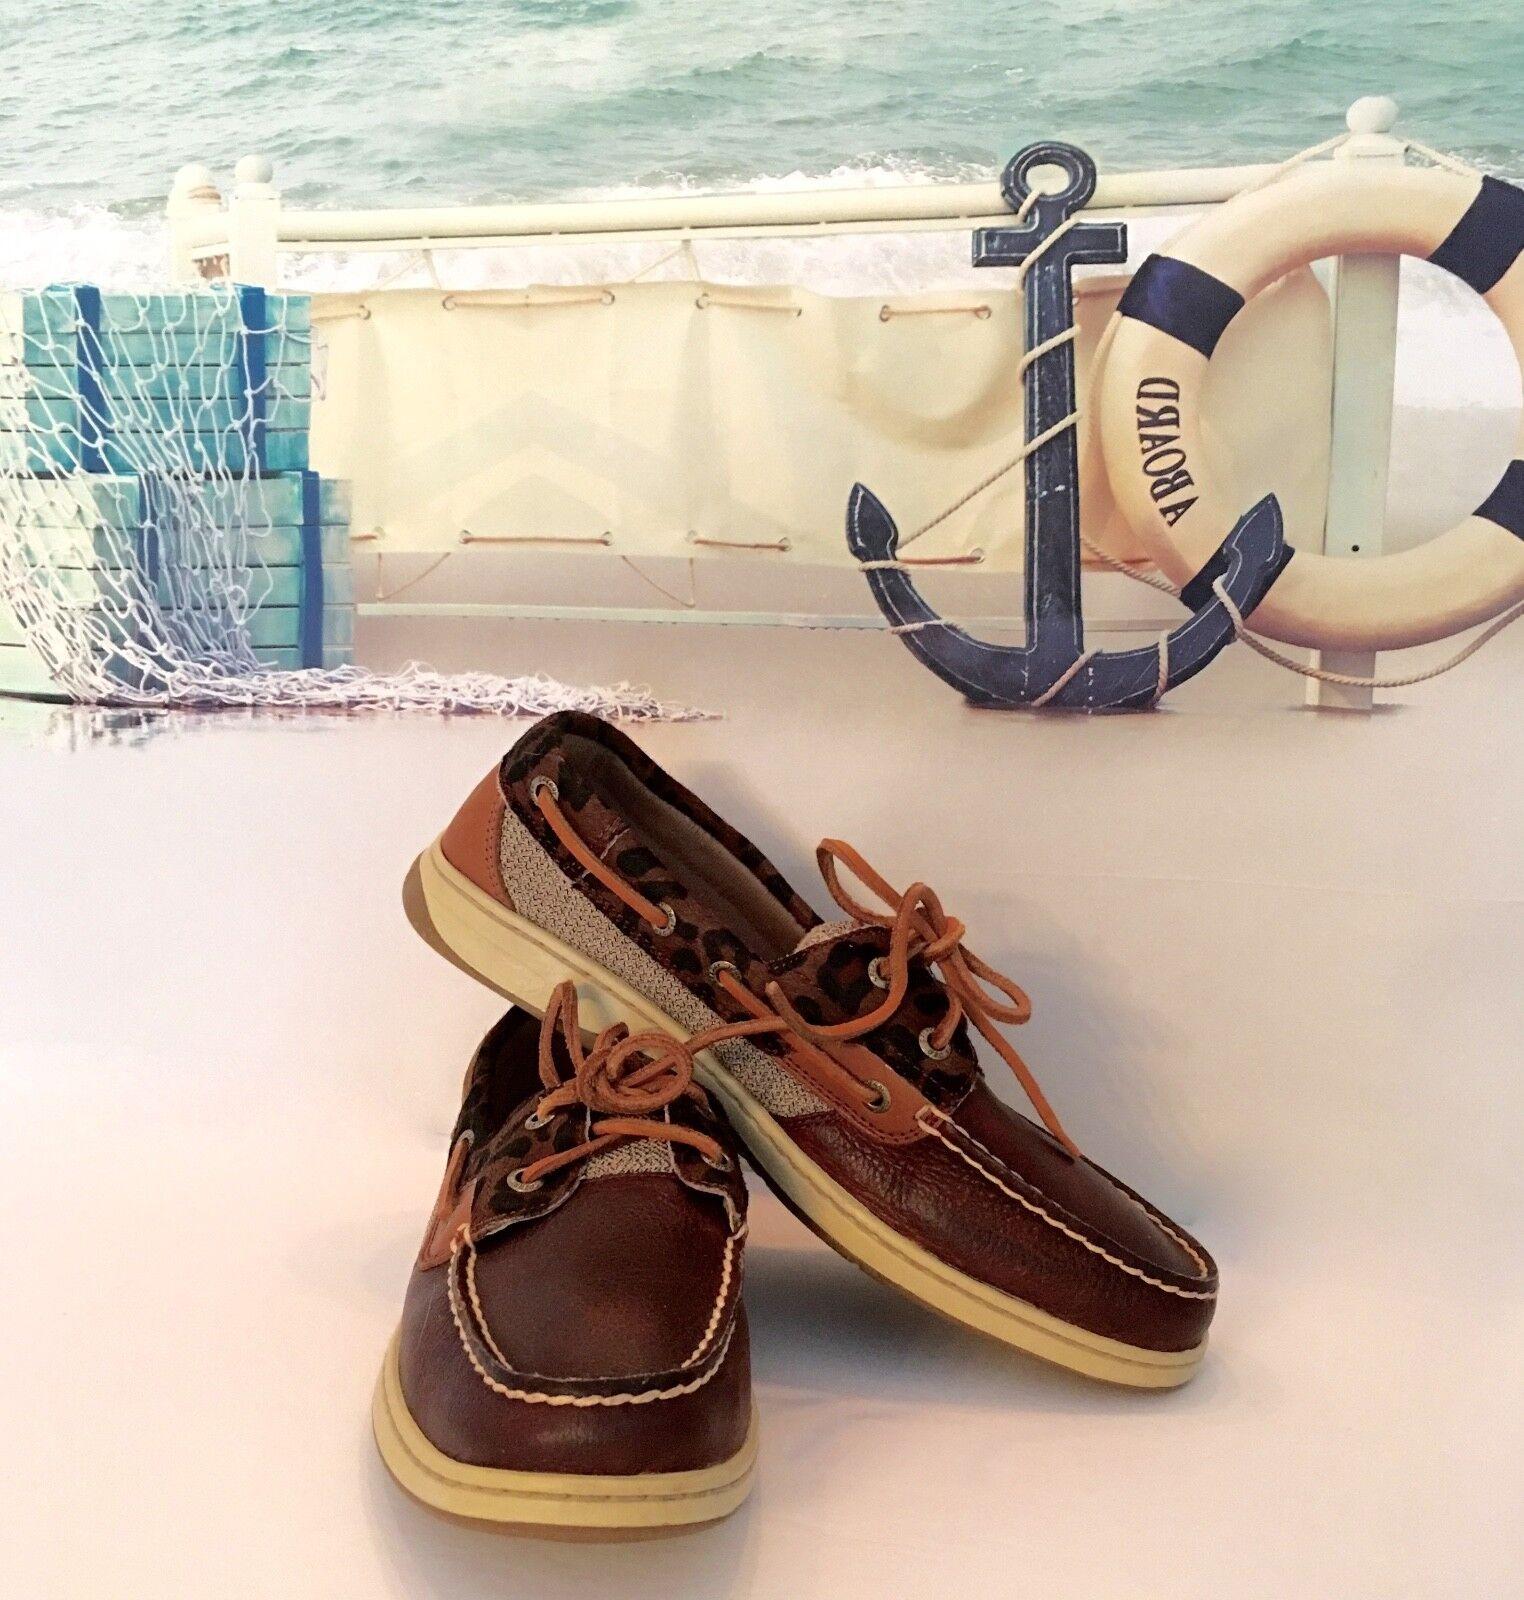 SPERRY Top-Sider Boat Schuhes Größe Leder & Canvas Größe Schuhes 9 5e9d6e